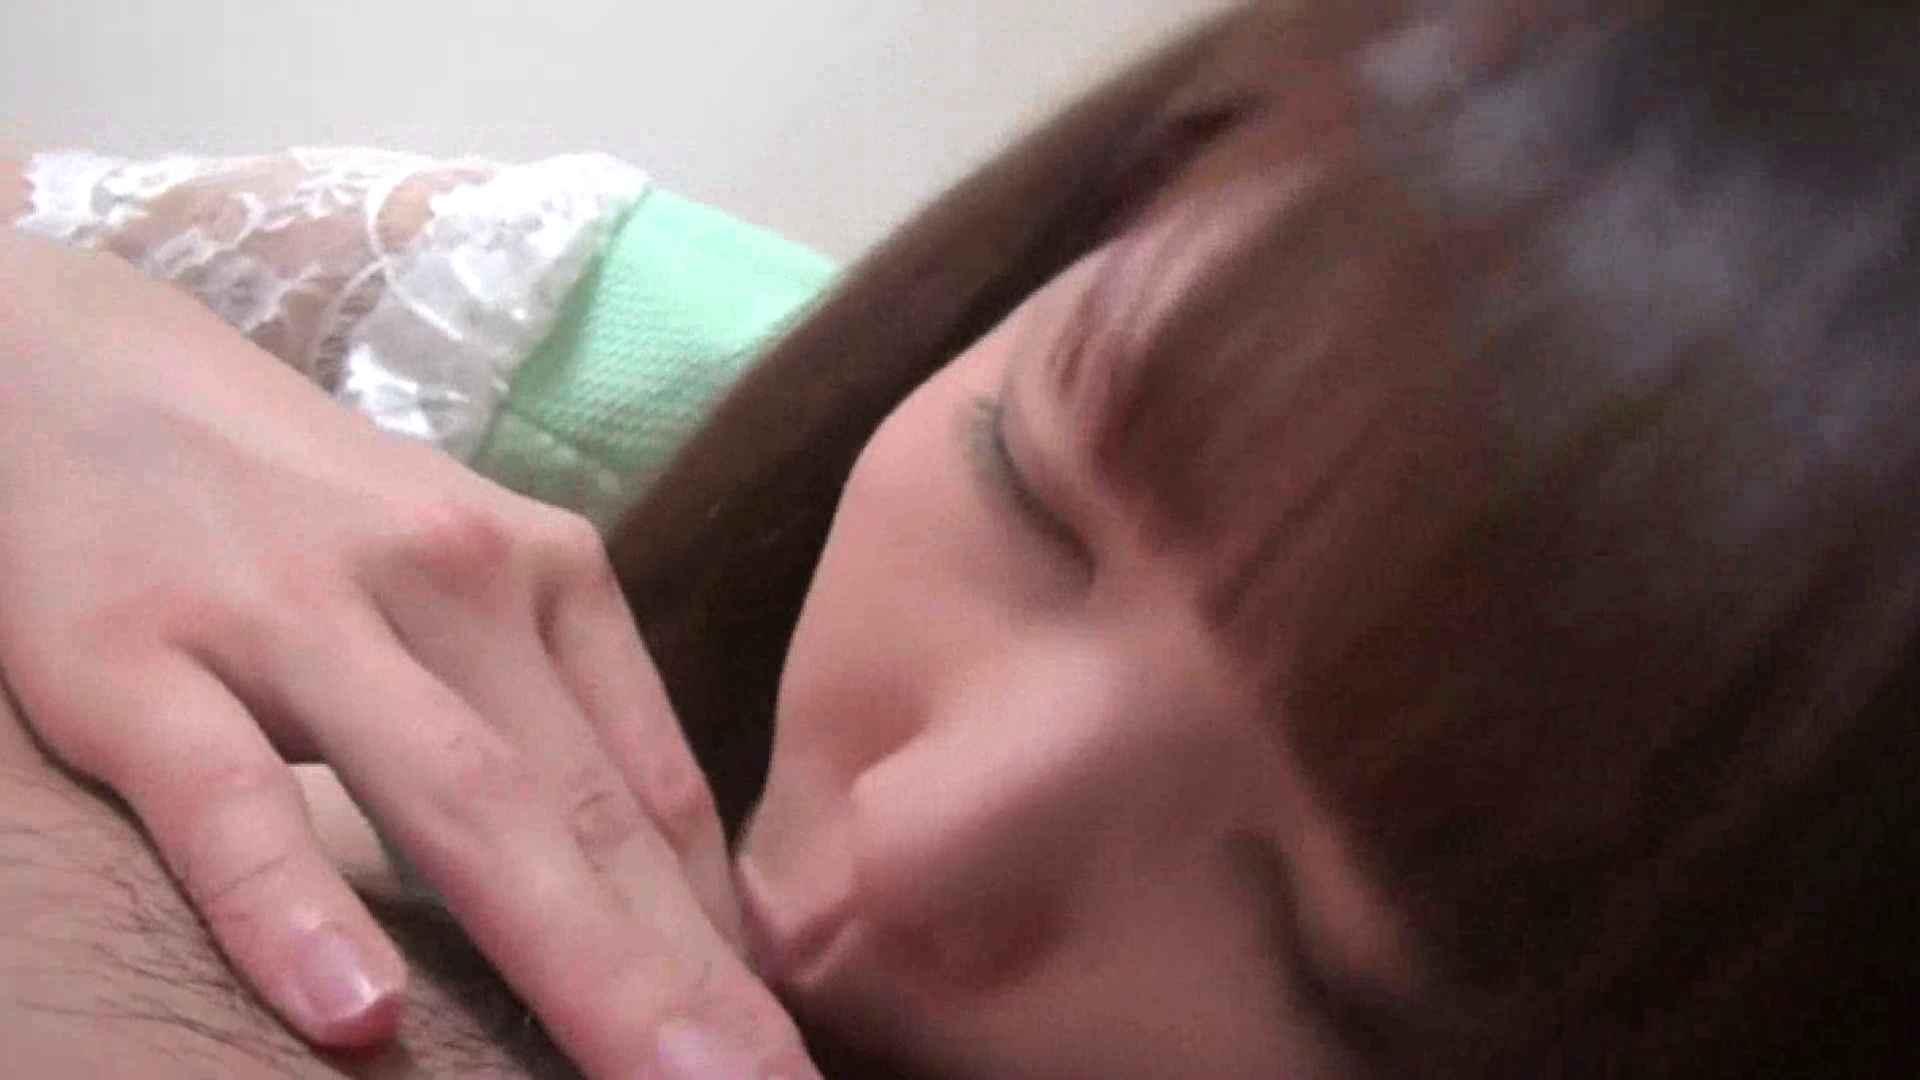 Hで可愛くてケシカラン! Vol.08 OLヌード天国  76PIX 24